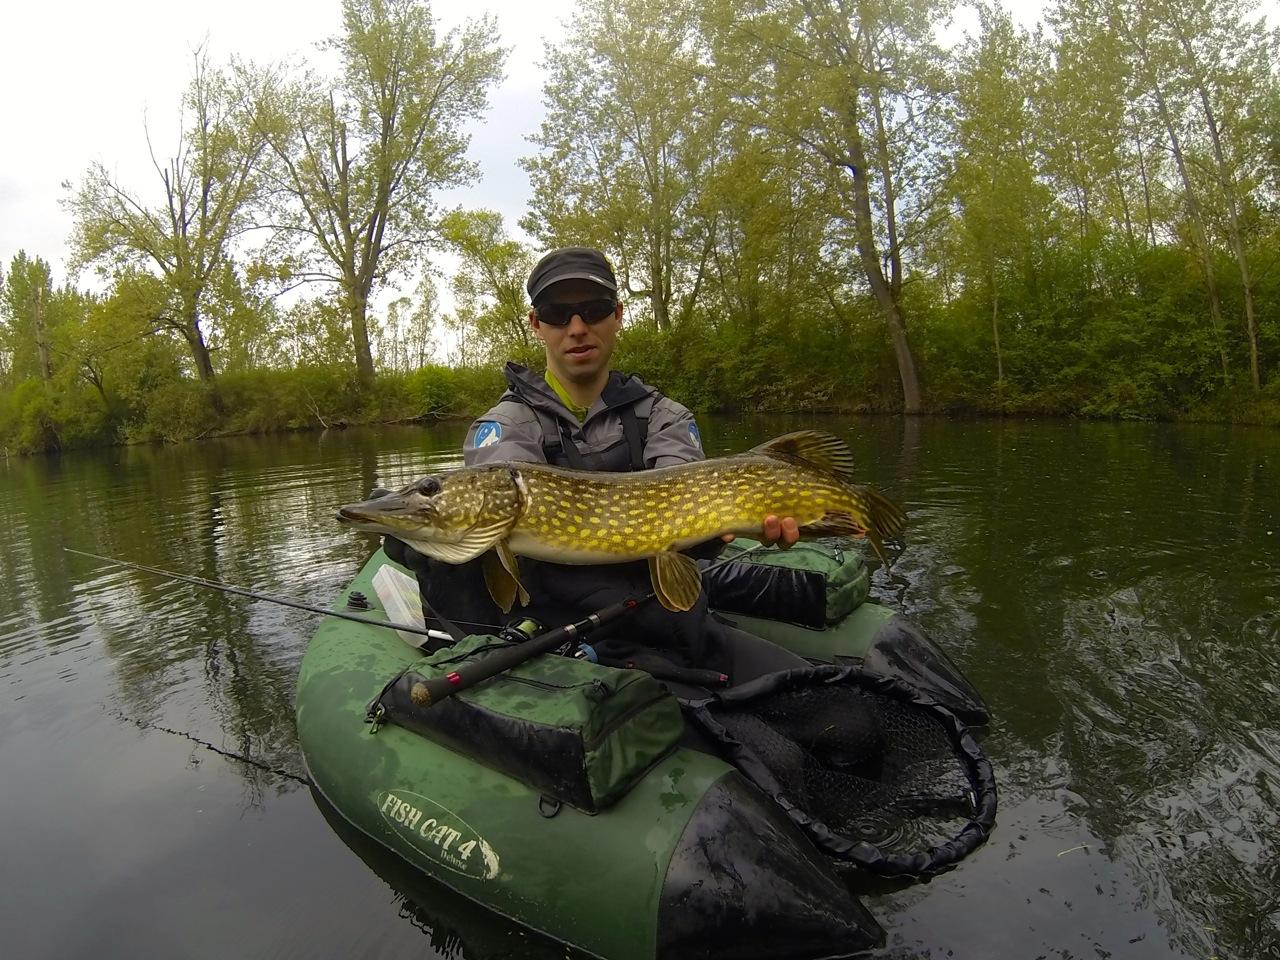 Benoit Bergaentzle de la team Raise-fishing